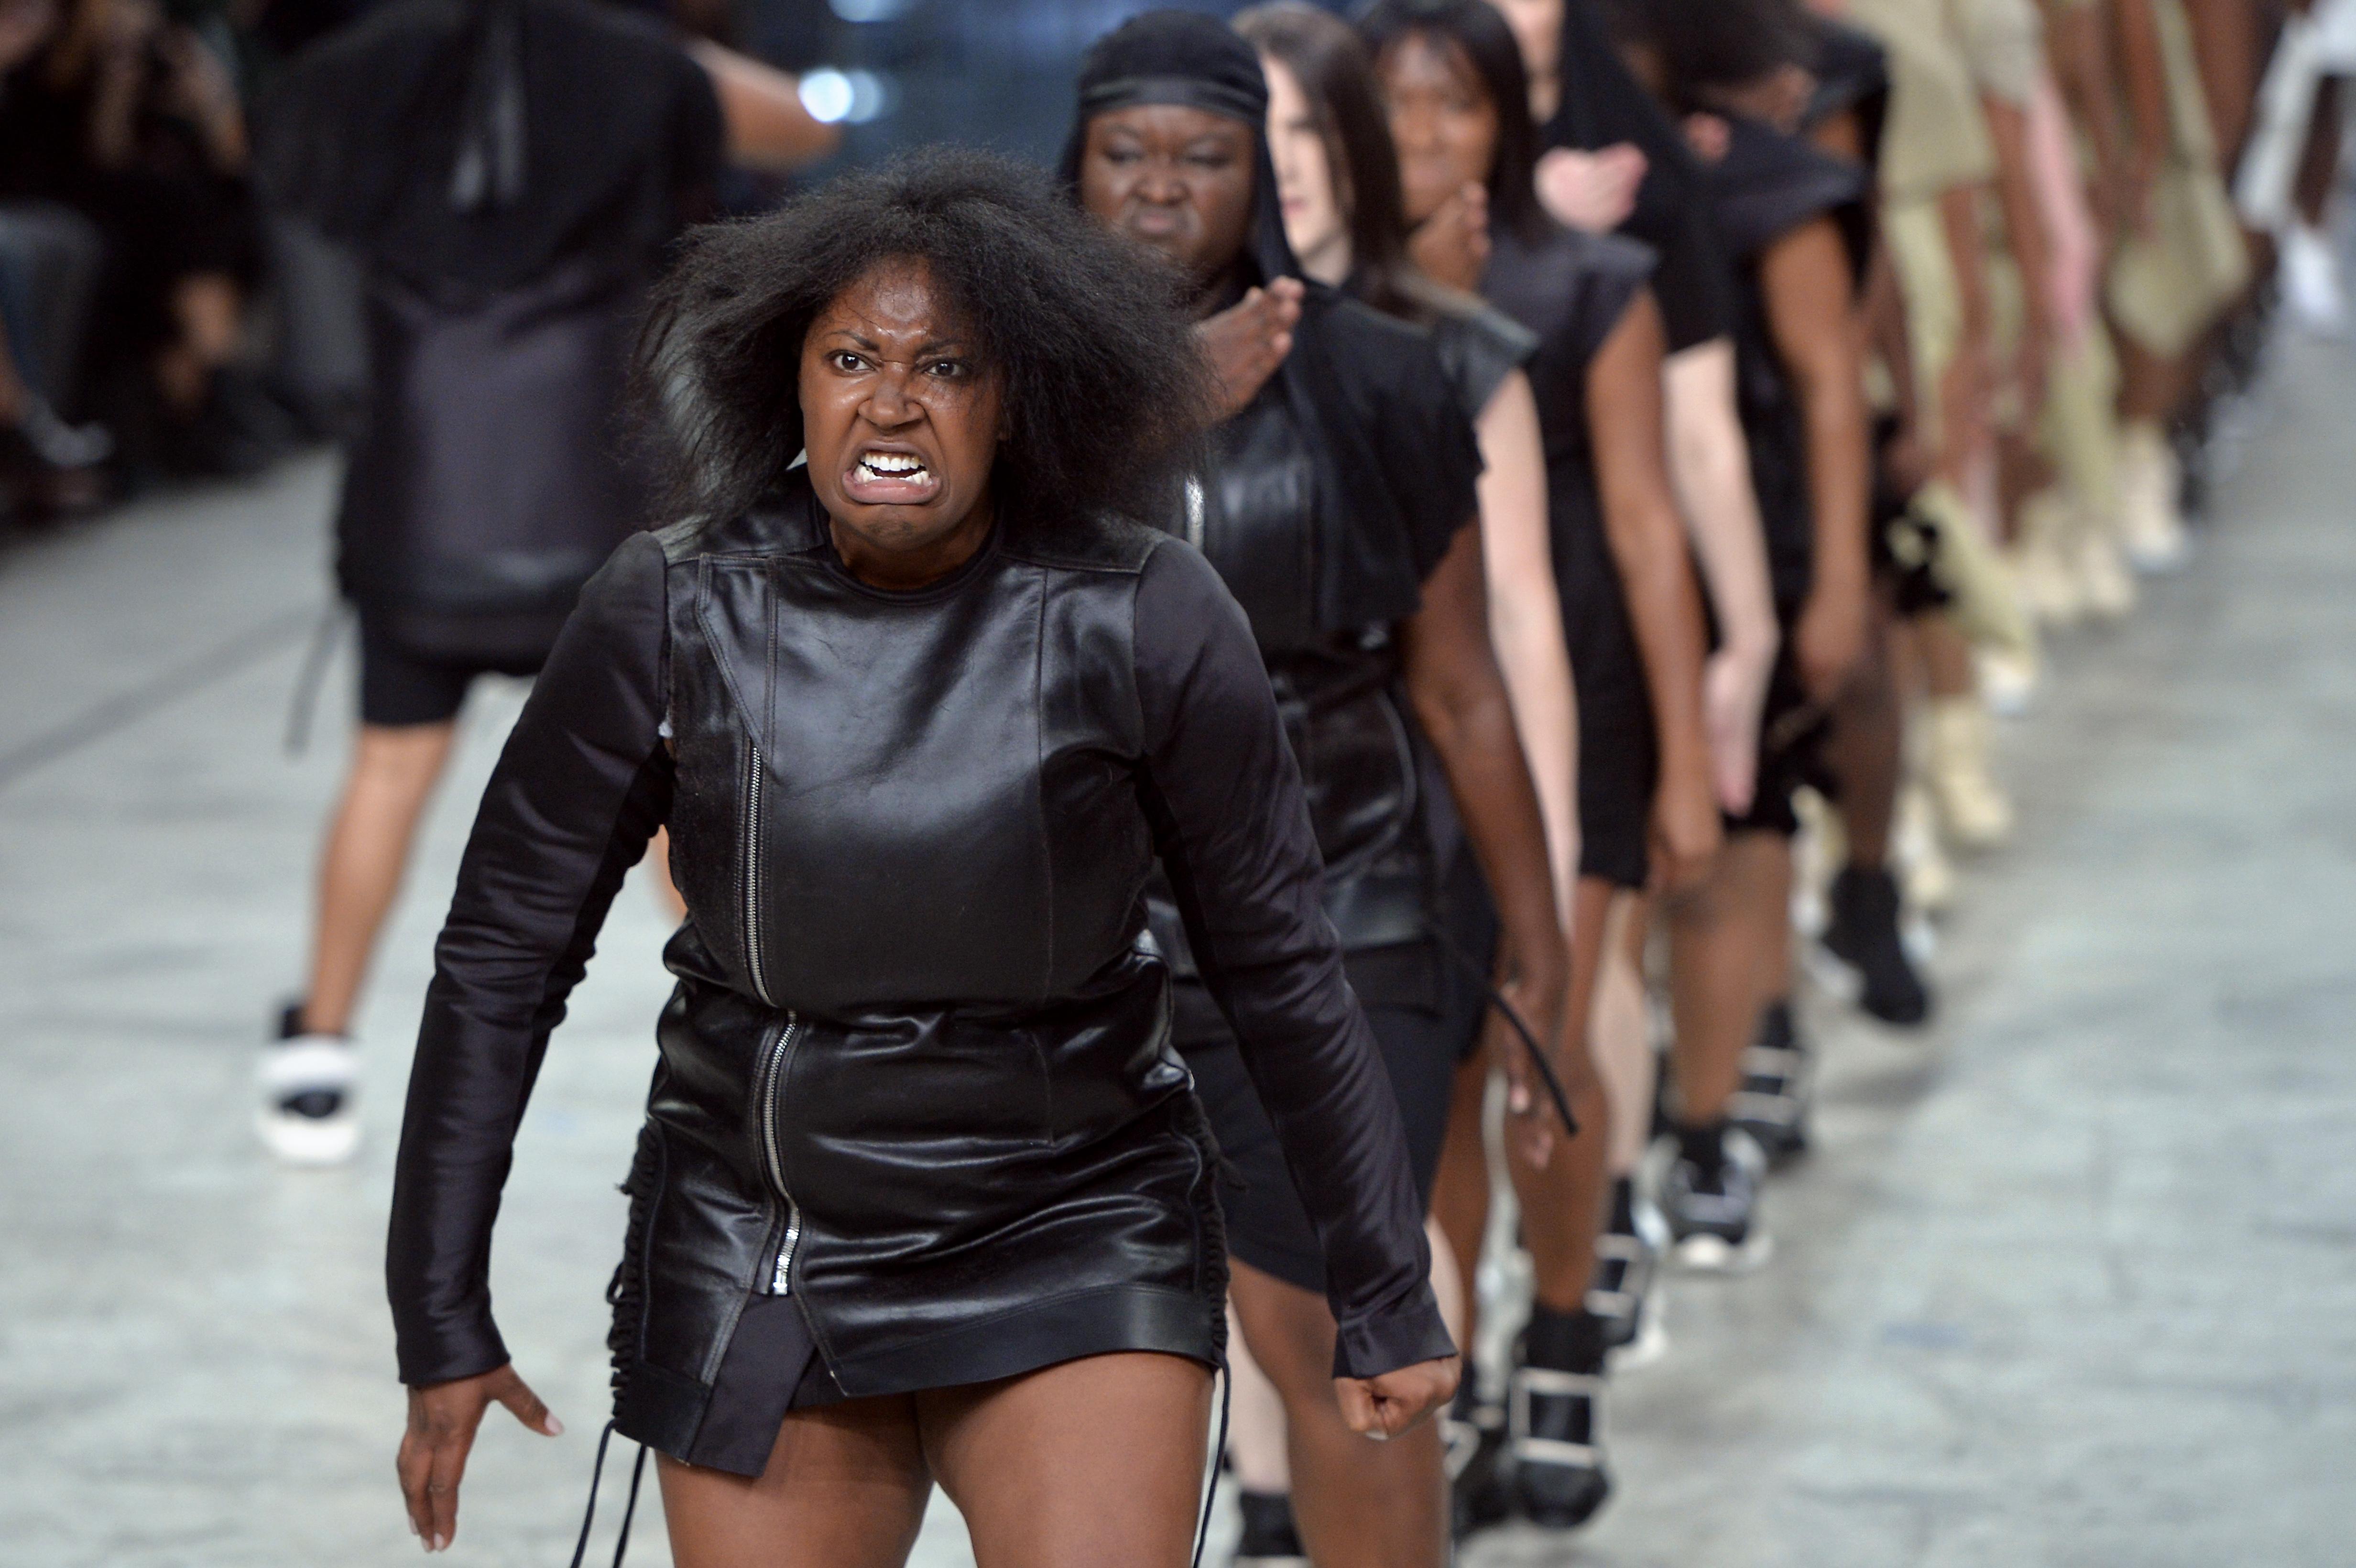 Rick Owens porta in passerella corpulente ballerine afro (FOTO)